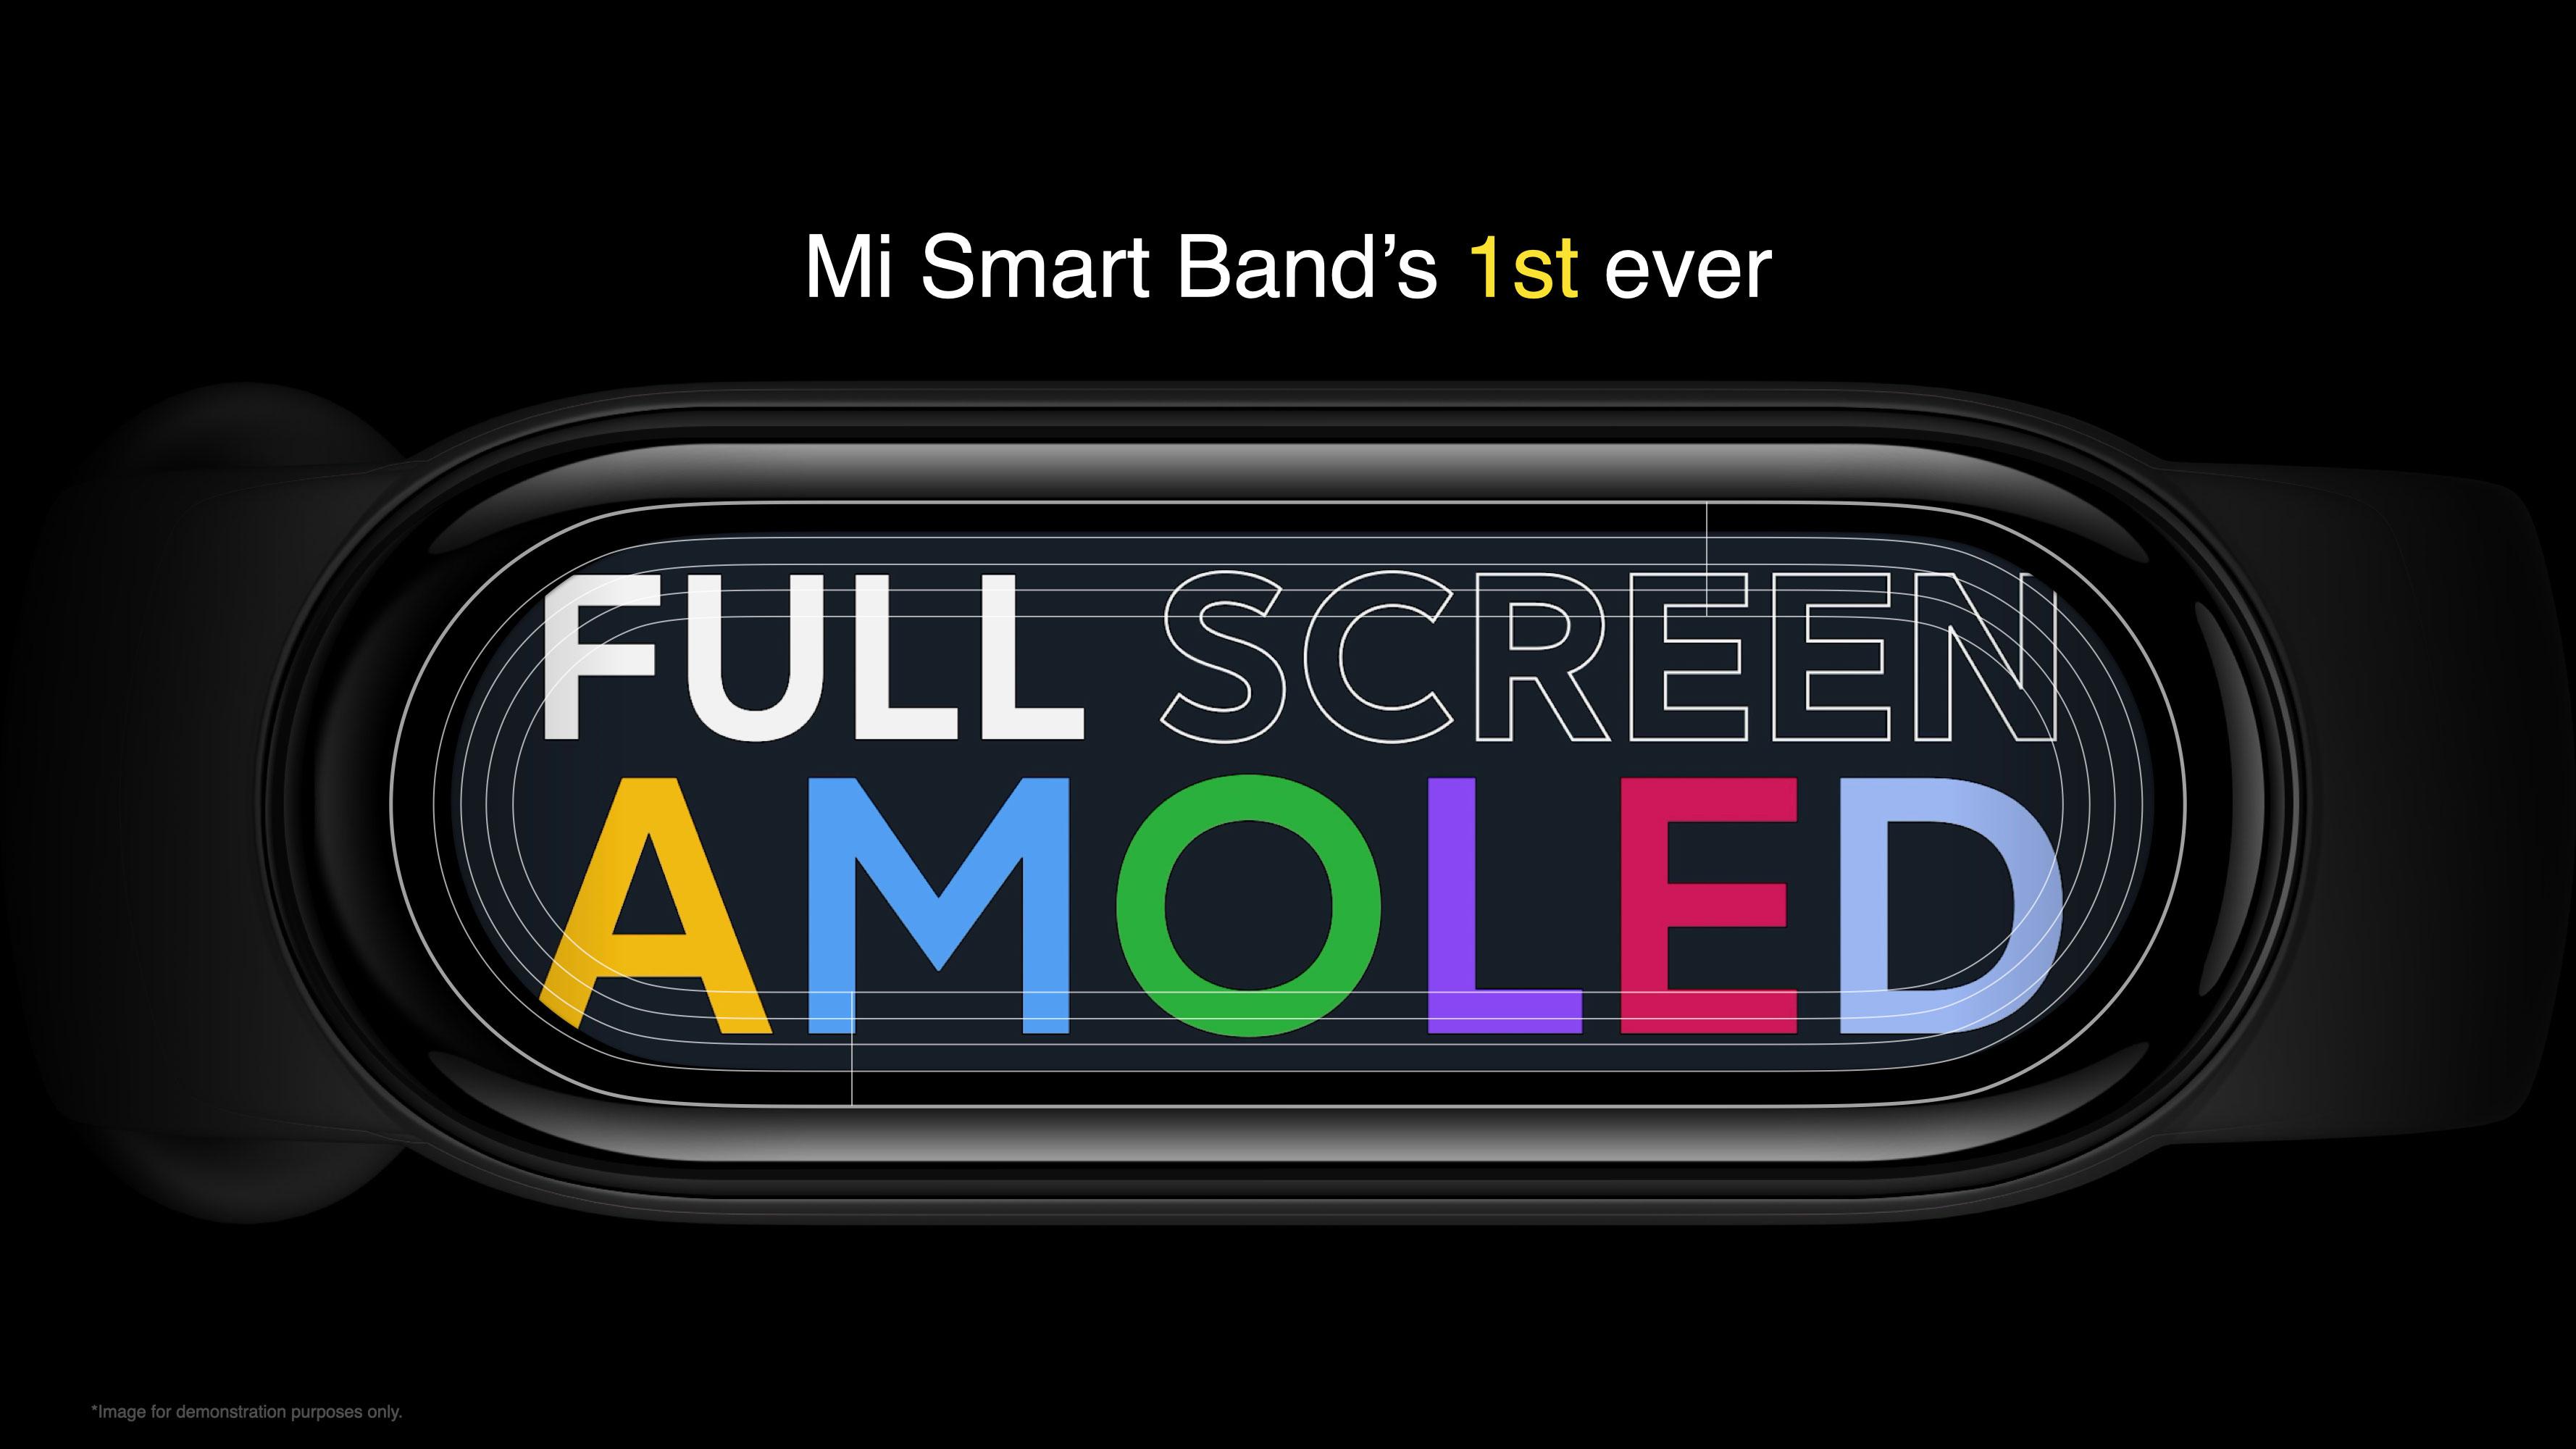 Mi Smart Band 6 vai contar com uma tela full screen Amoled!